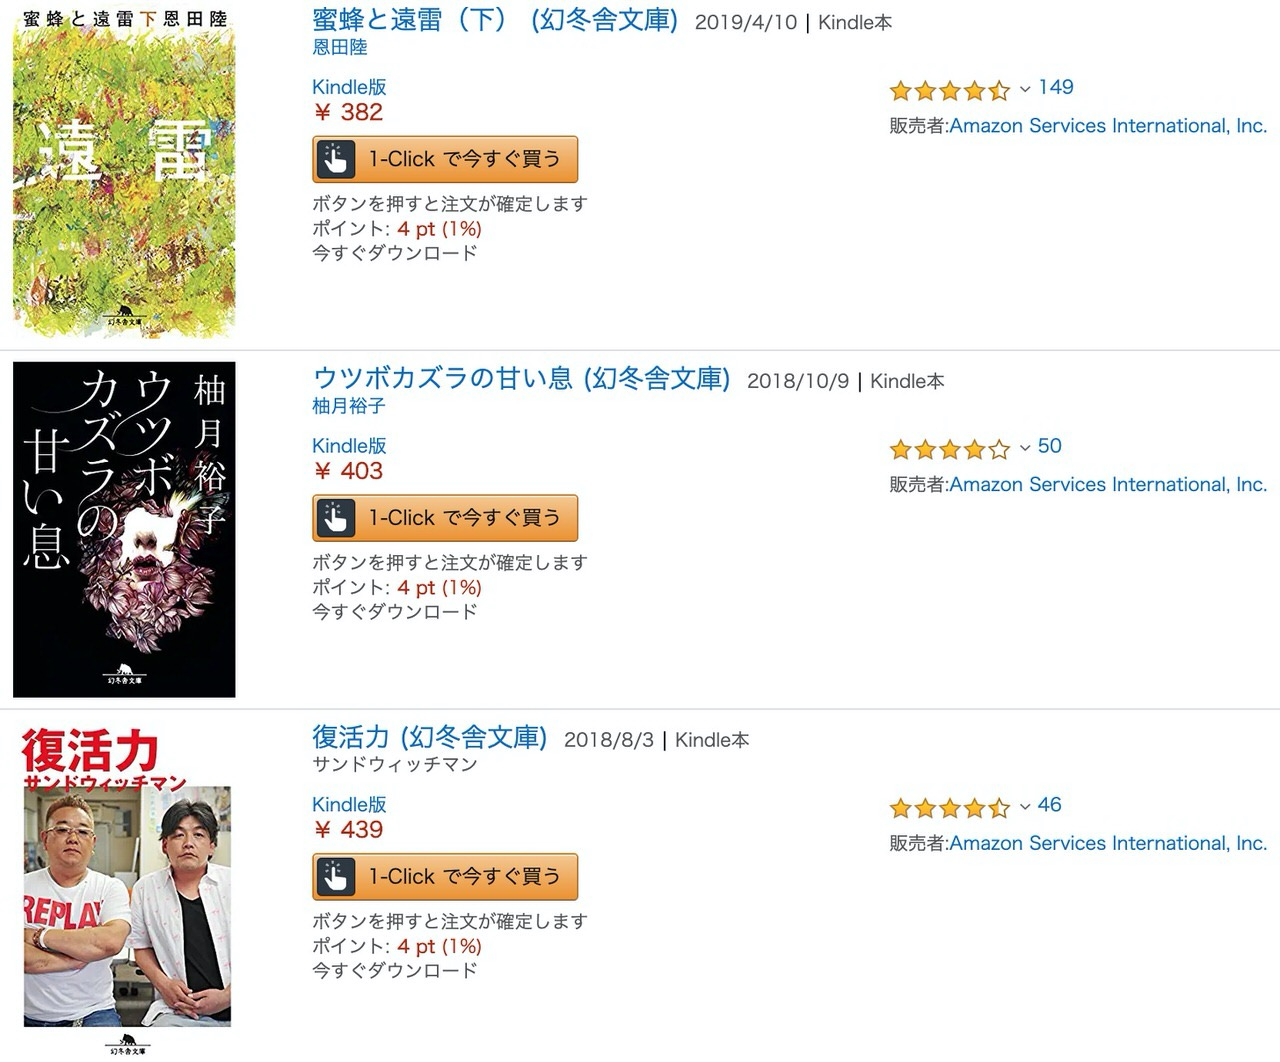 【Kindleセール】サンドウィッチマンの復活力、貴様いつまで女子でいるつもりだ問題、蜜蜂と遠雷など「幻冬舎文庫 2020春」(4/23まで)